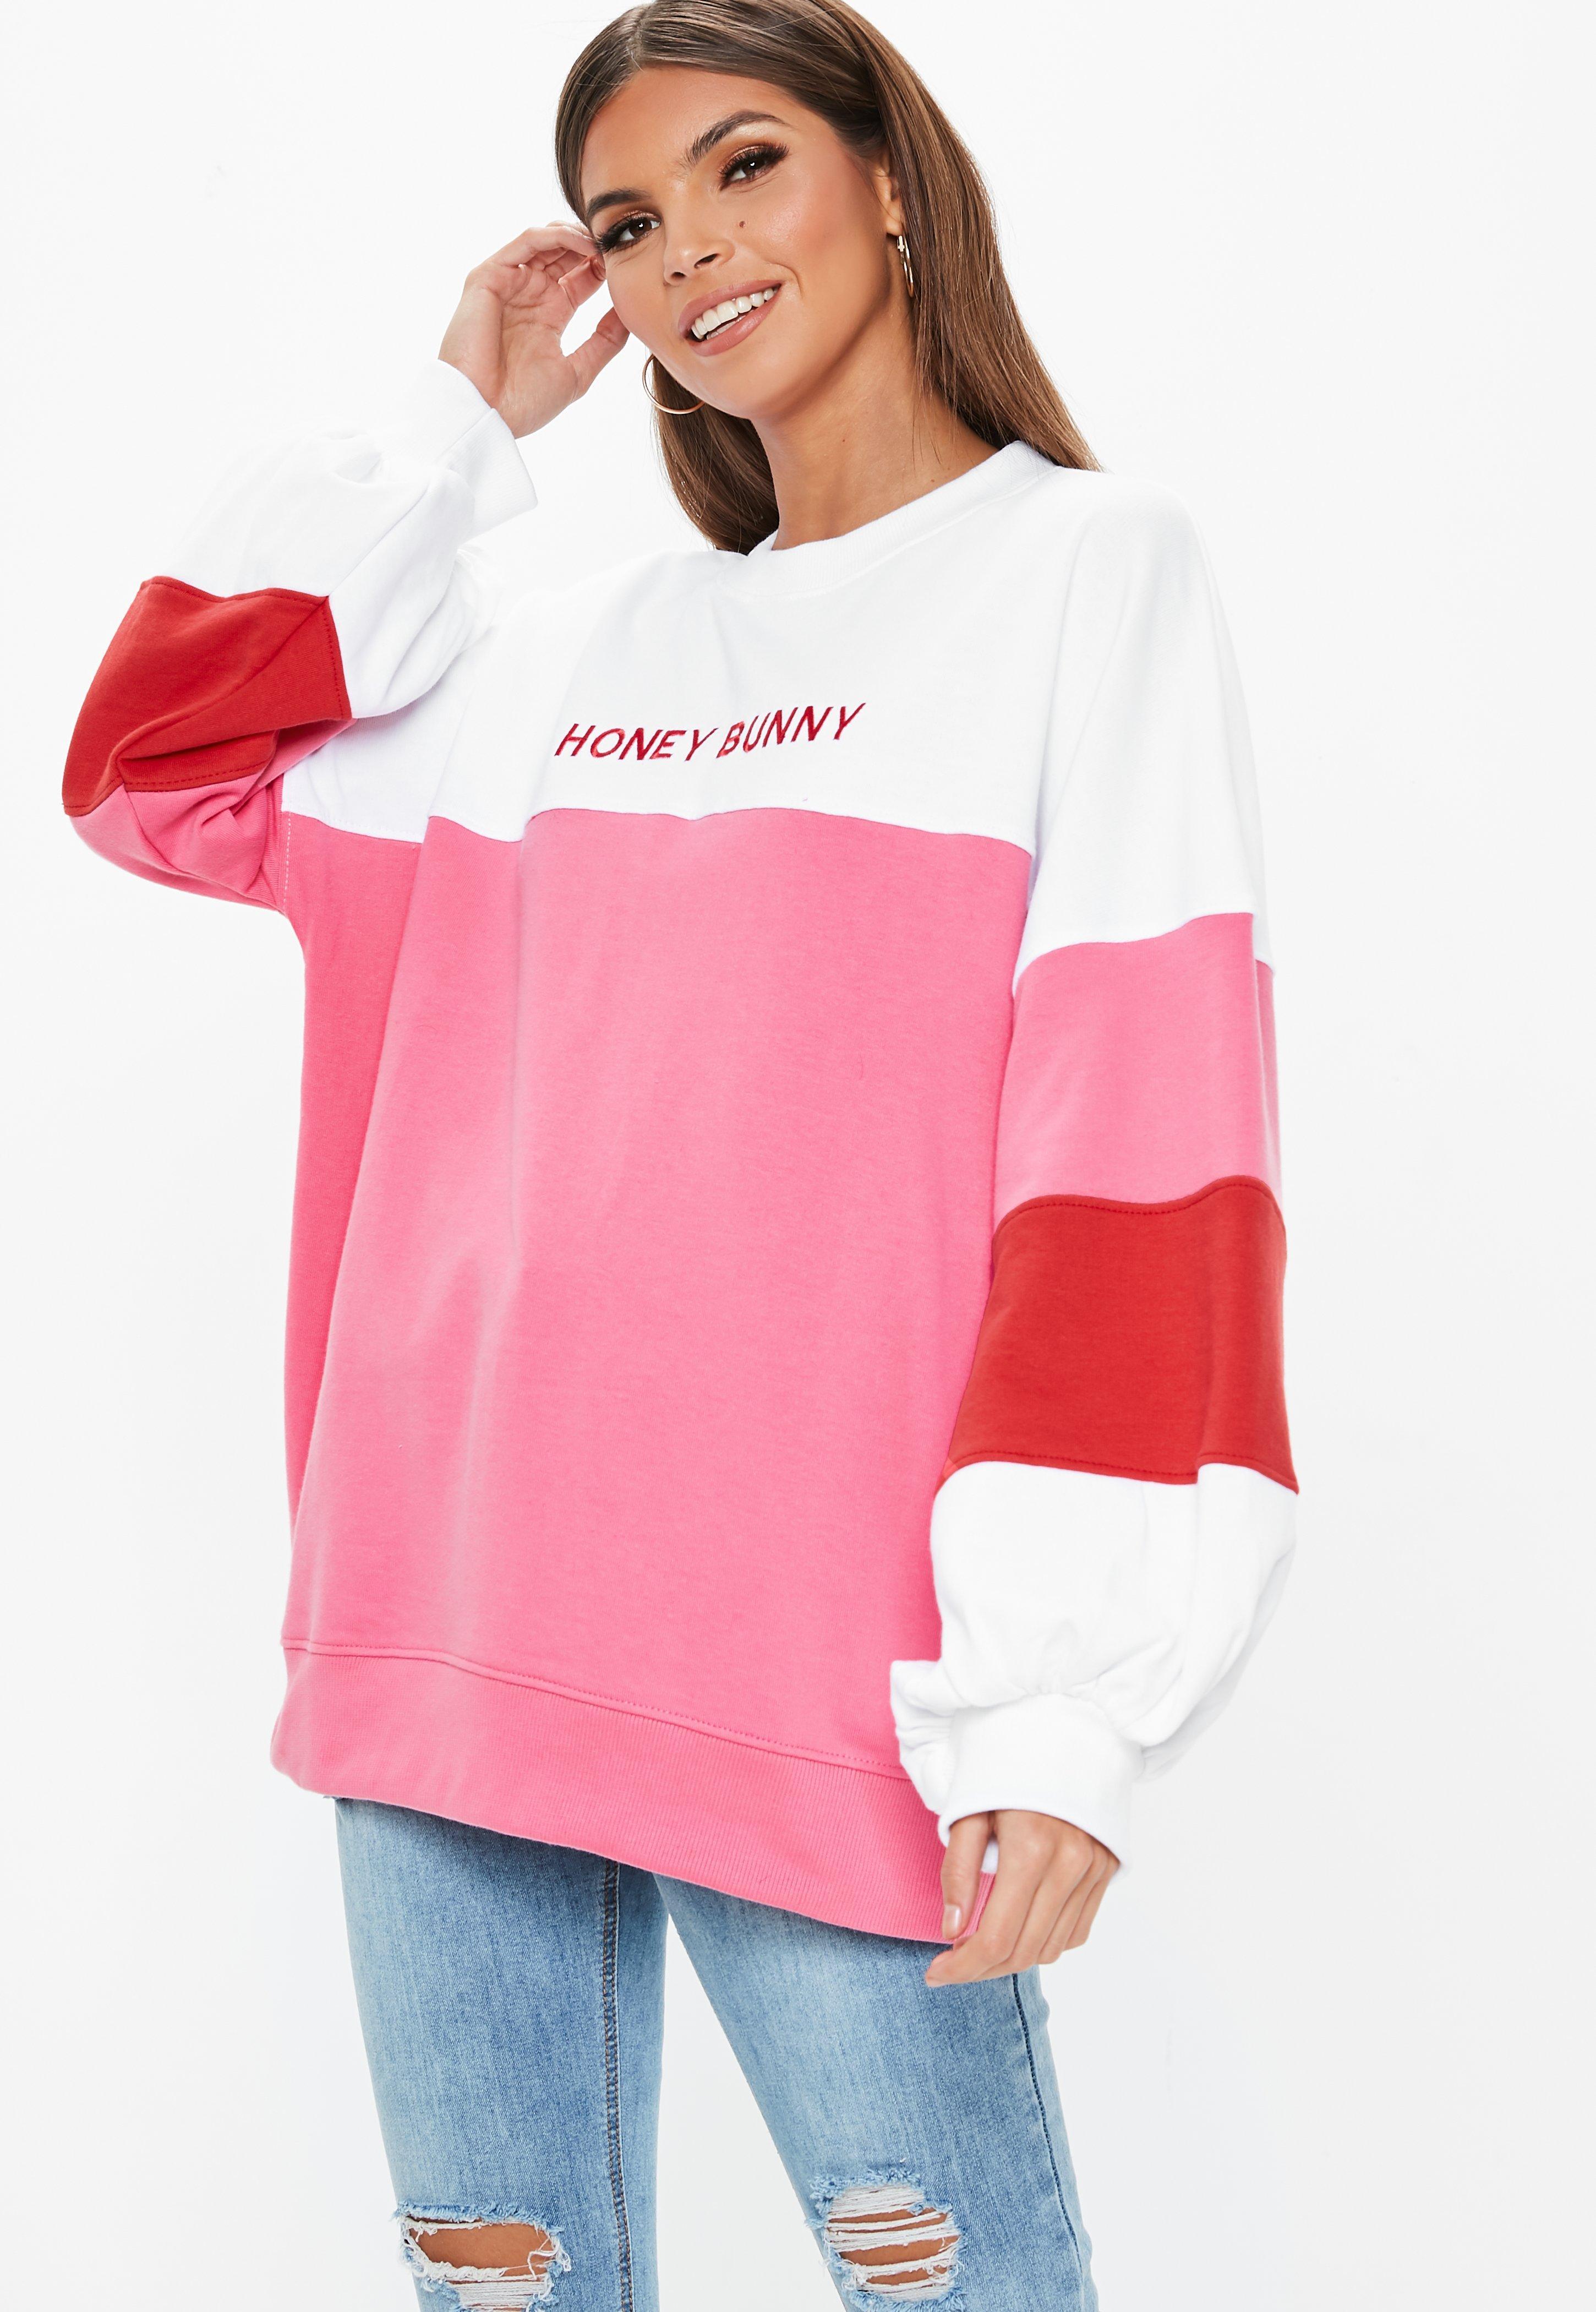 7b1fdac5638bb Sweatshirts